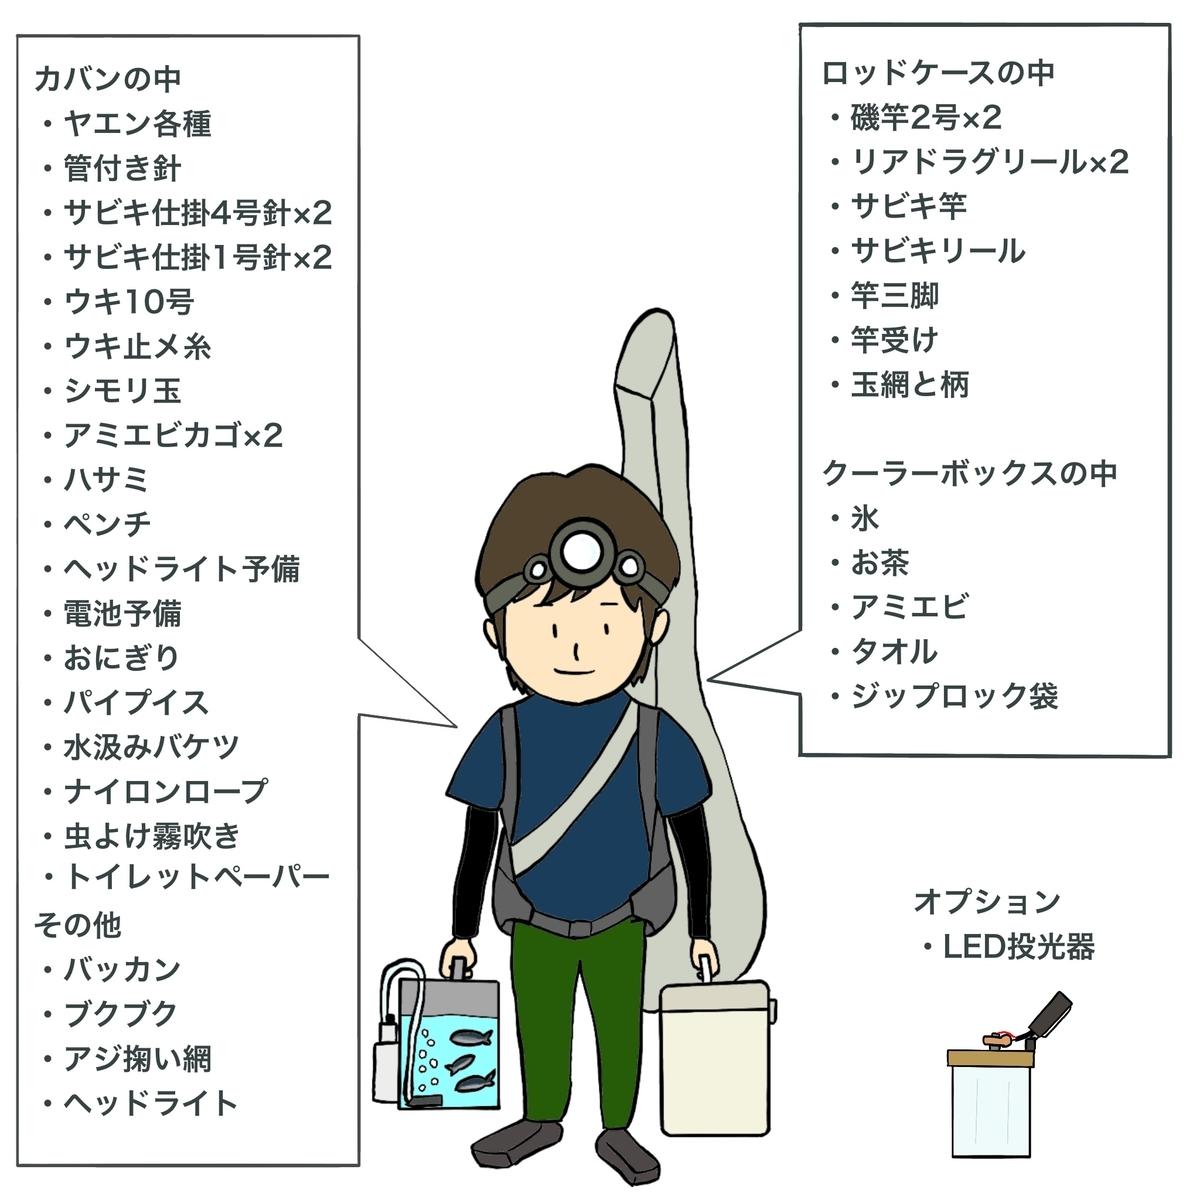 f:id:gomateishoku:20190908104332j:plain